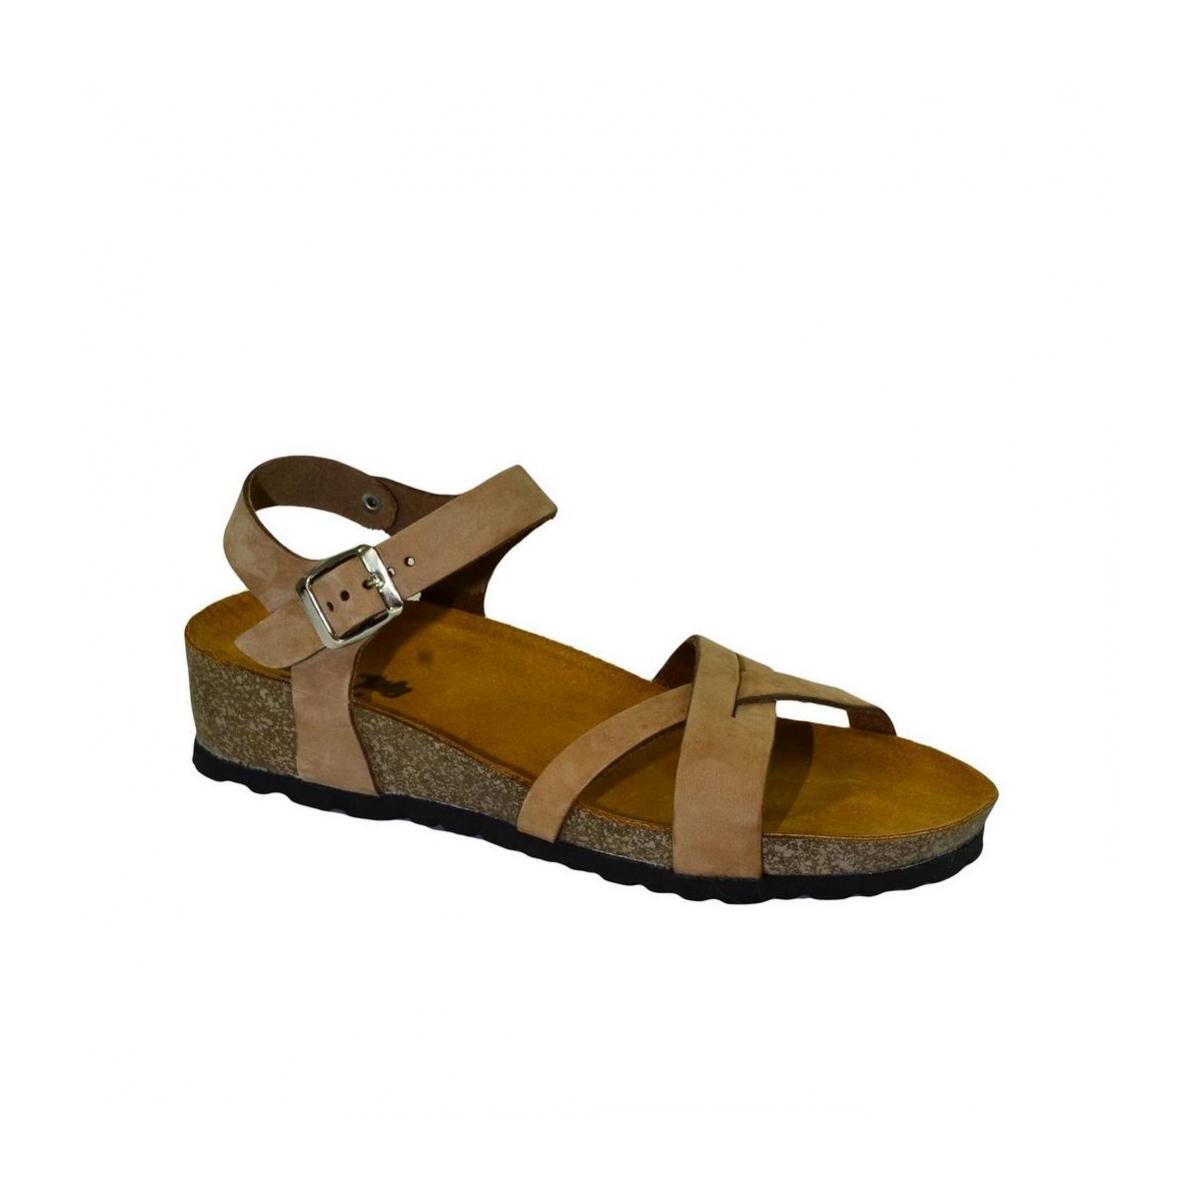 e92b3a278d Dámske hnedé sandále CAPI - 2